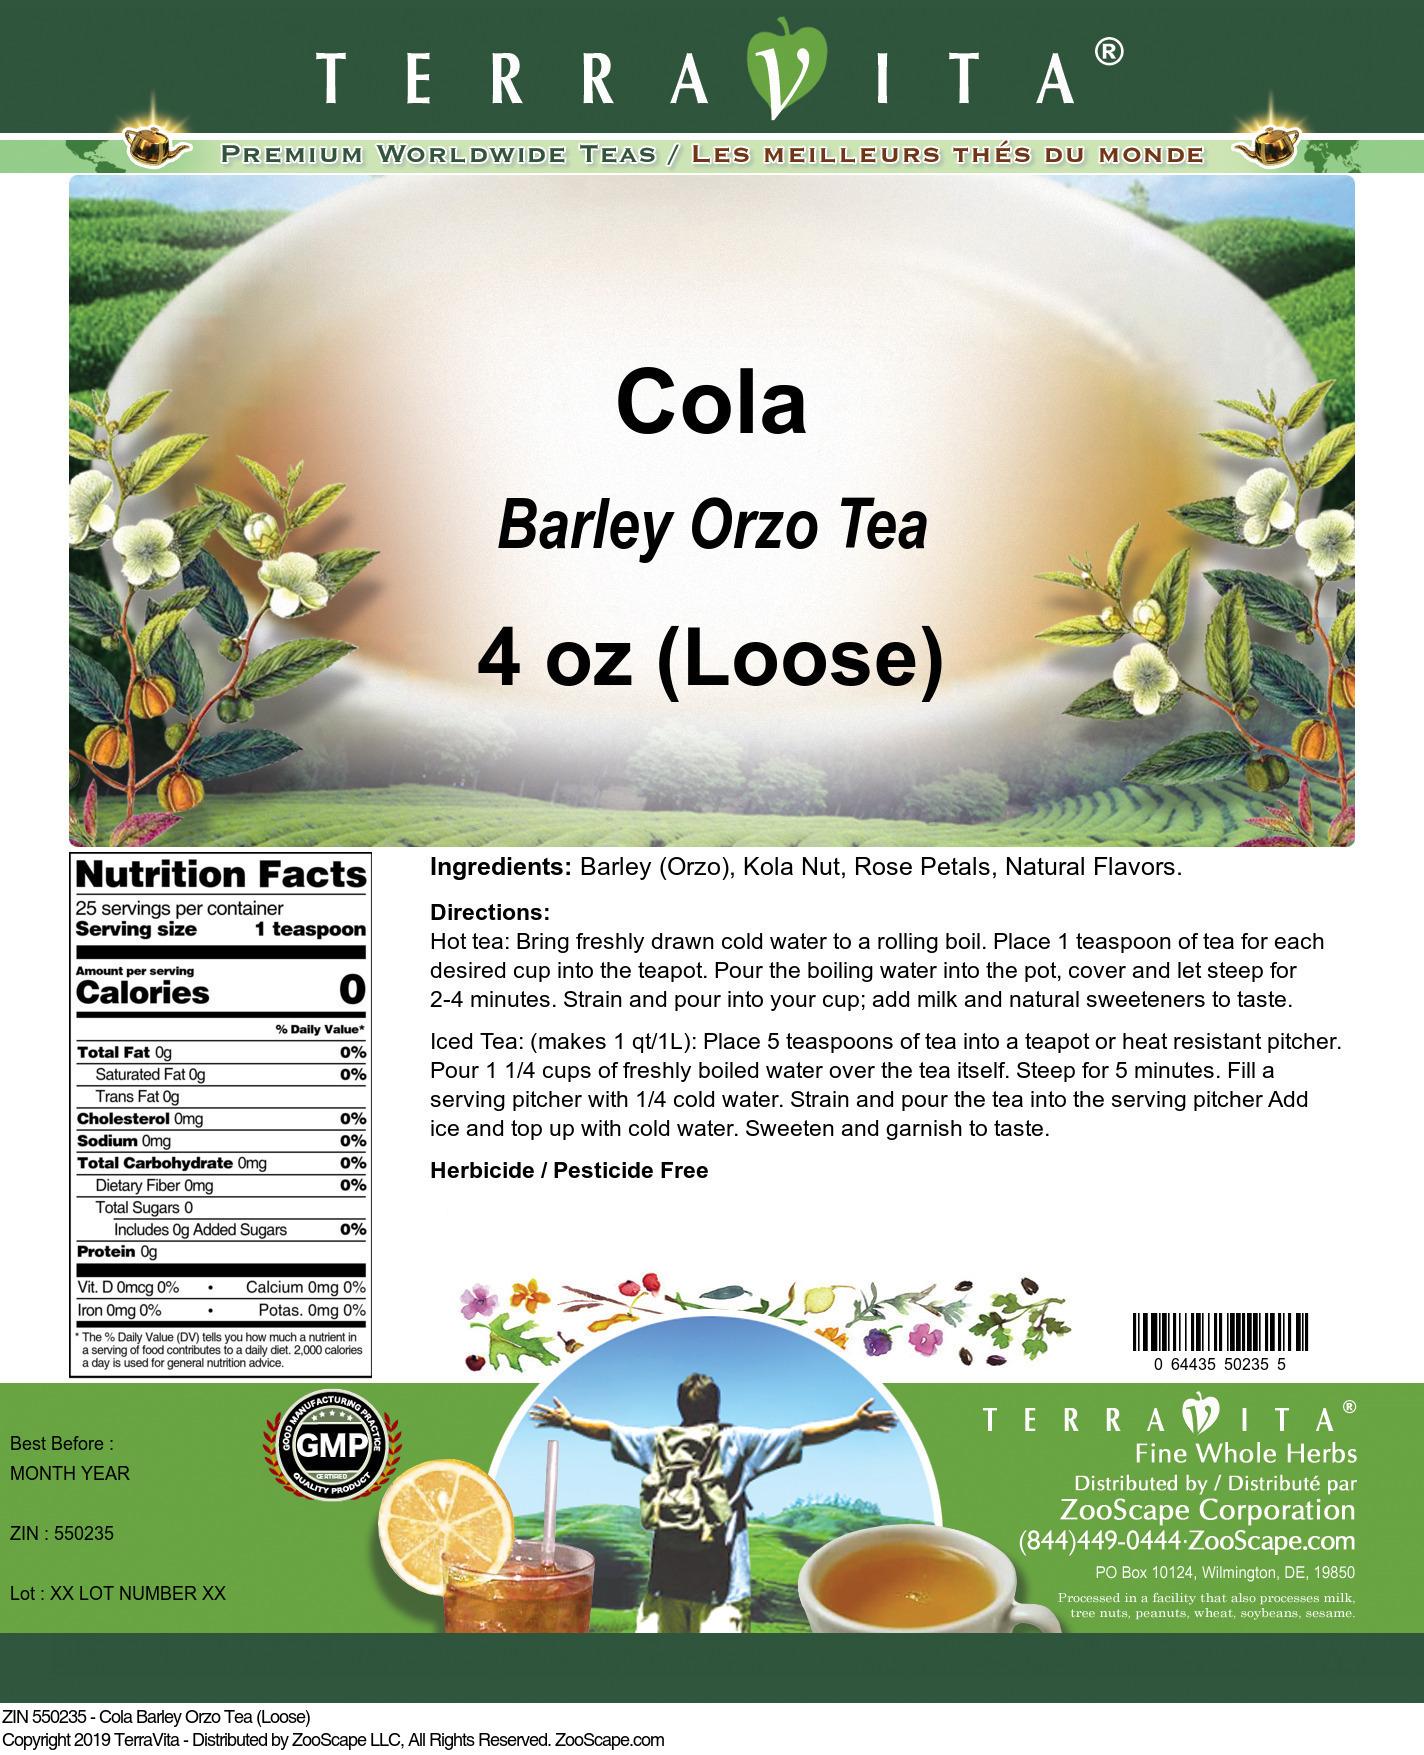 Cola Barley Orzo Tea (Loose)